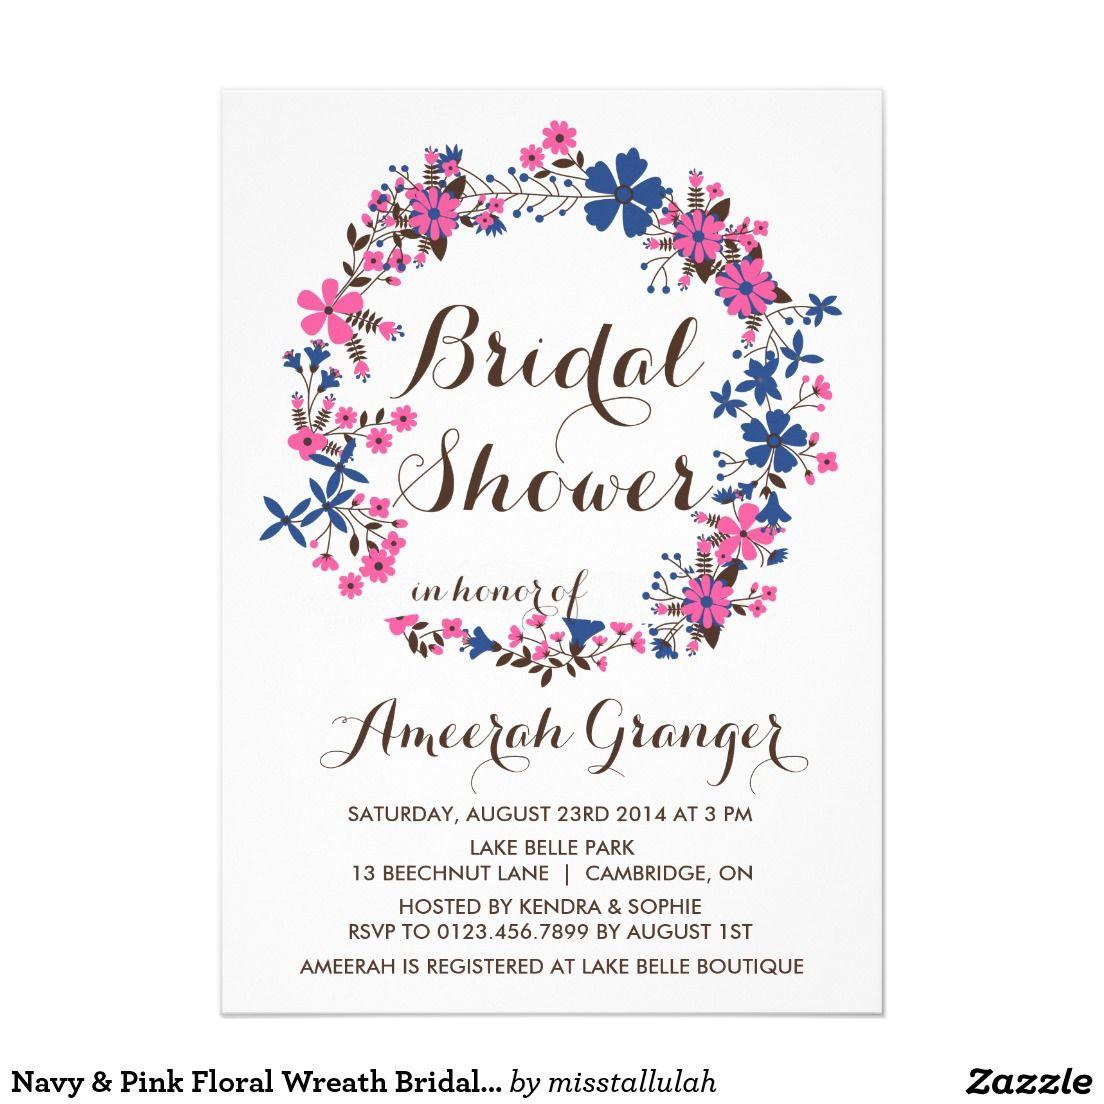 Navy & Pink Floral Wreath Bridal Shower Invitation